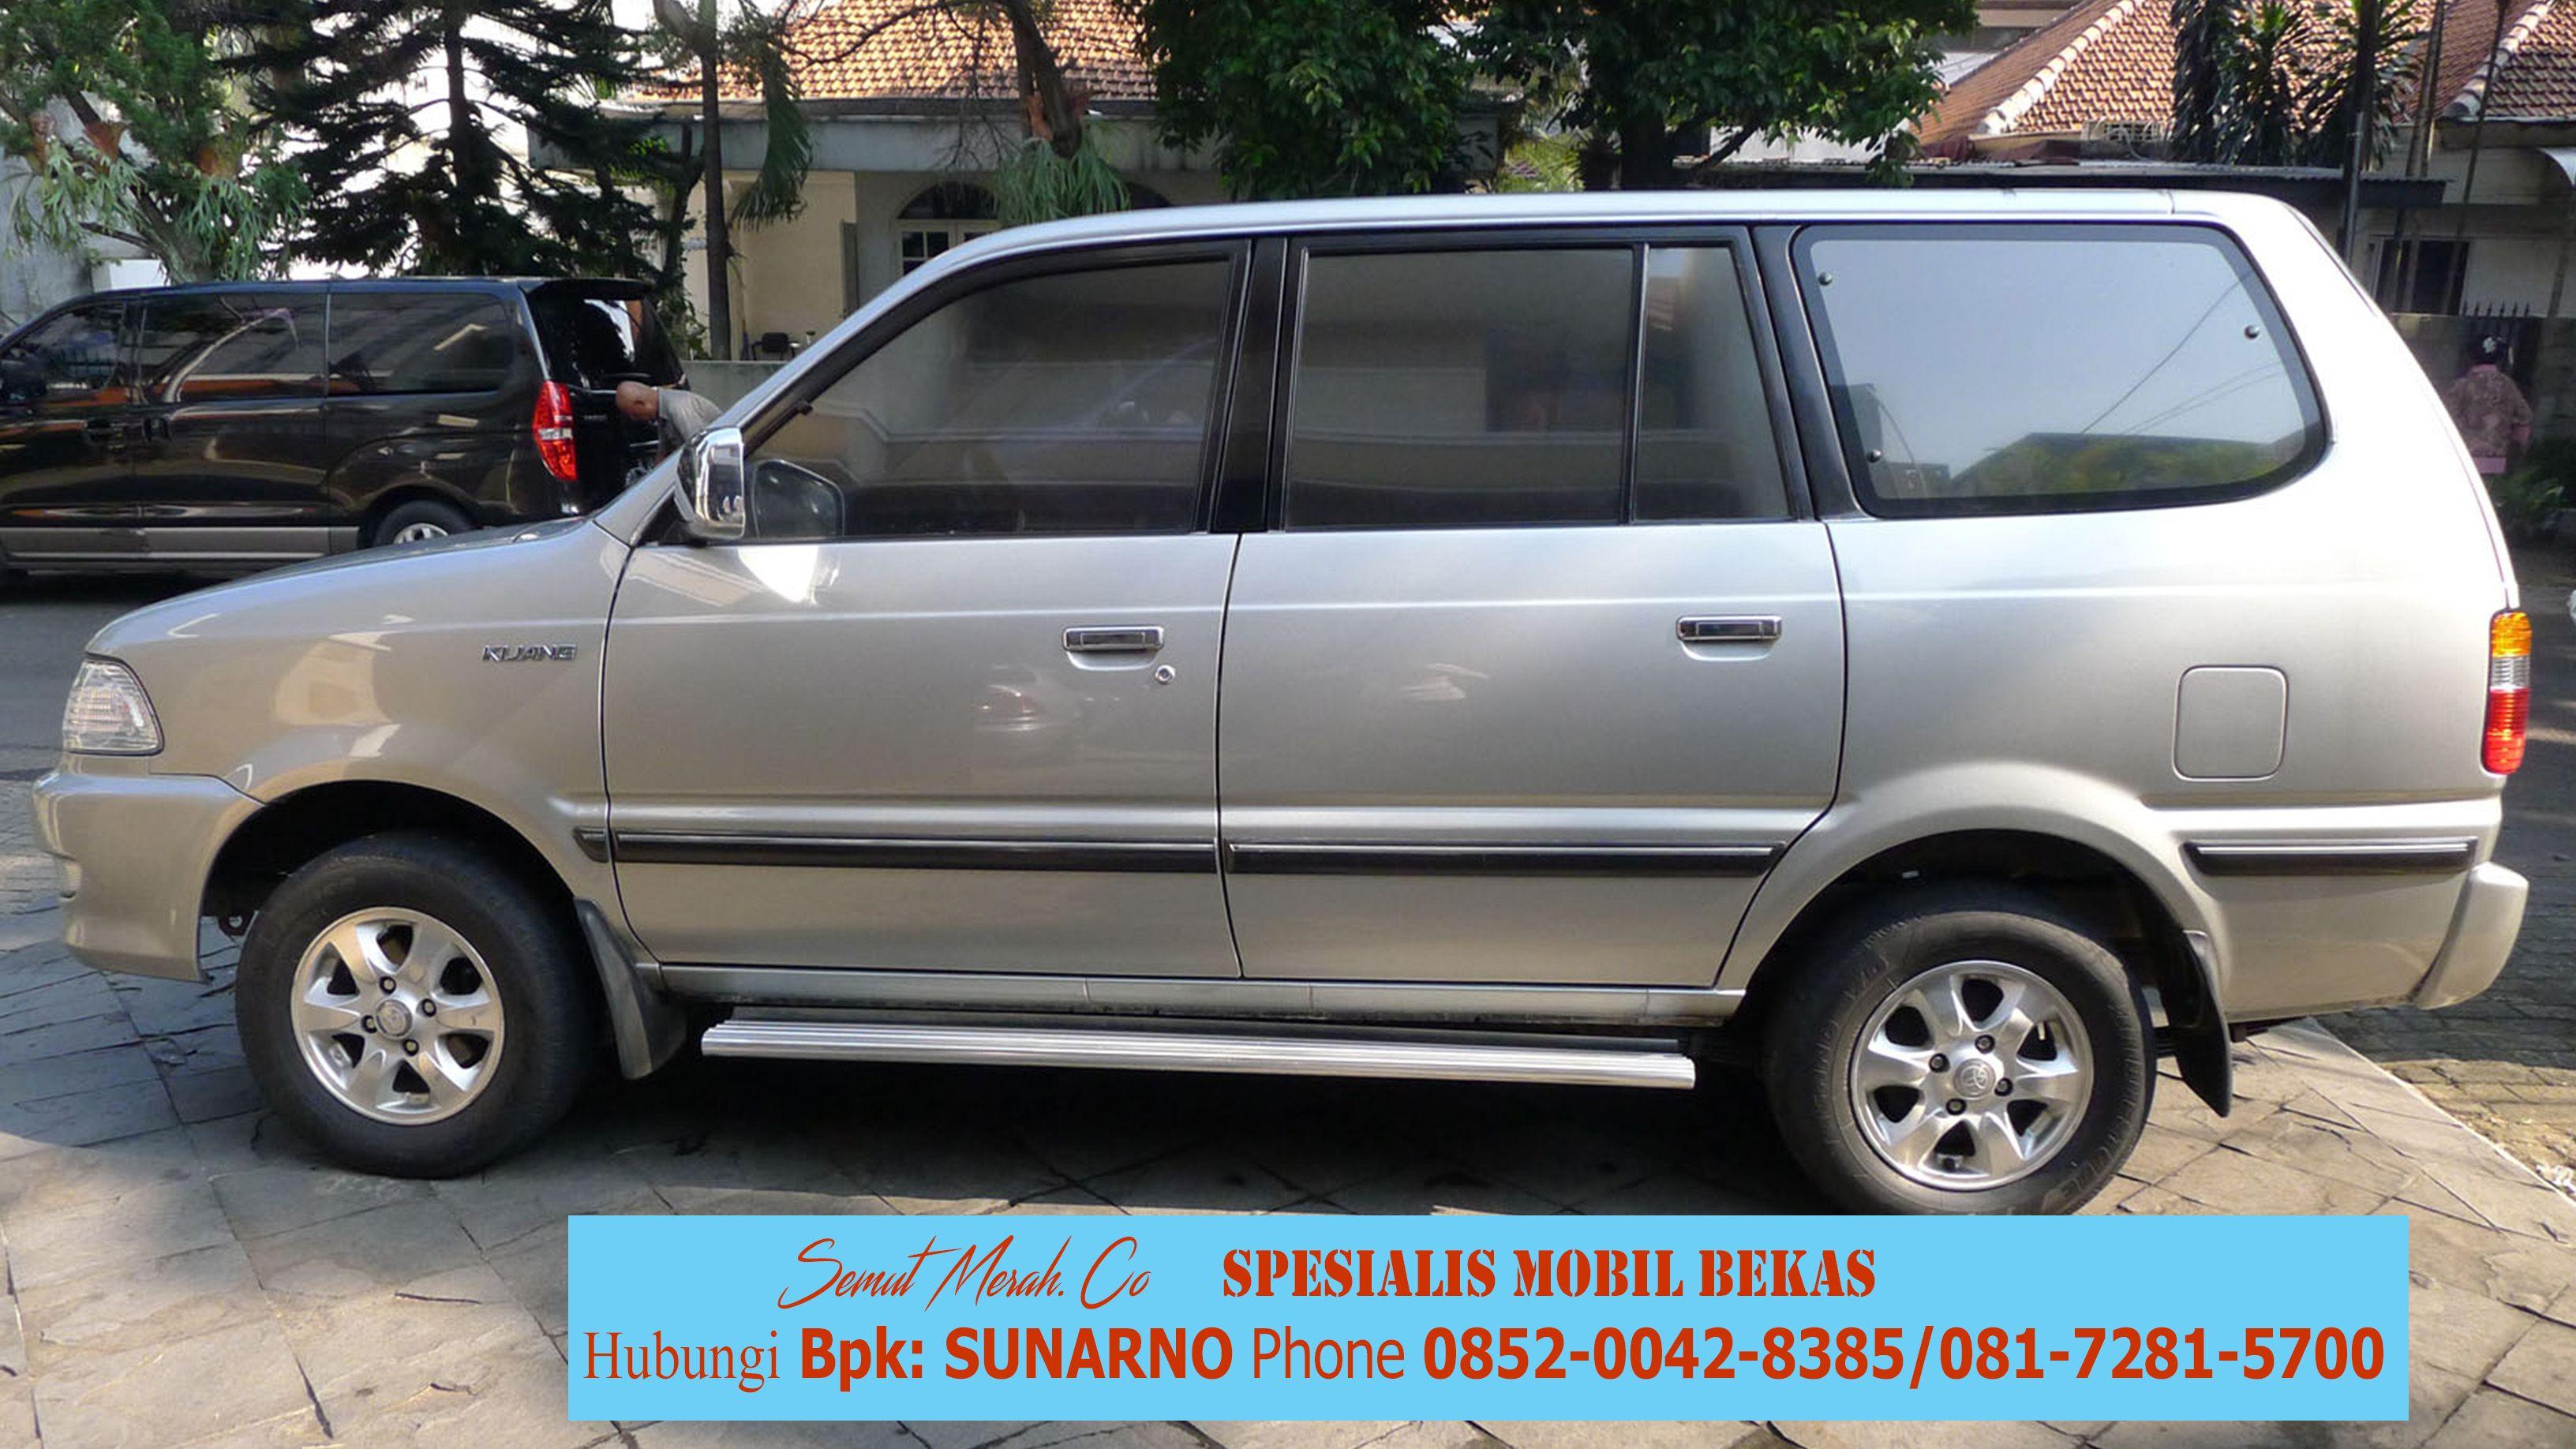 Mobil Bekas Toyota Kijang Bali – Fiat World Test Drive